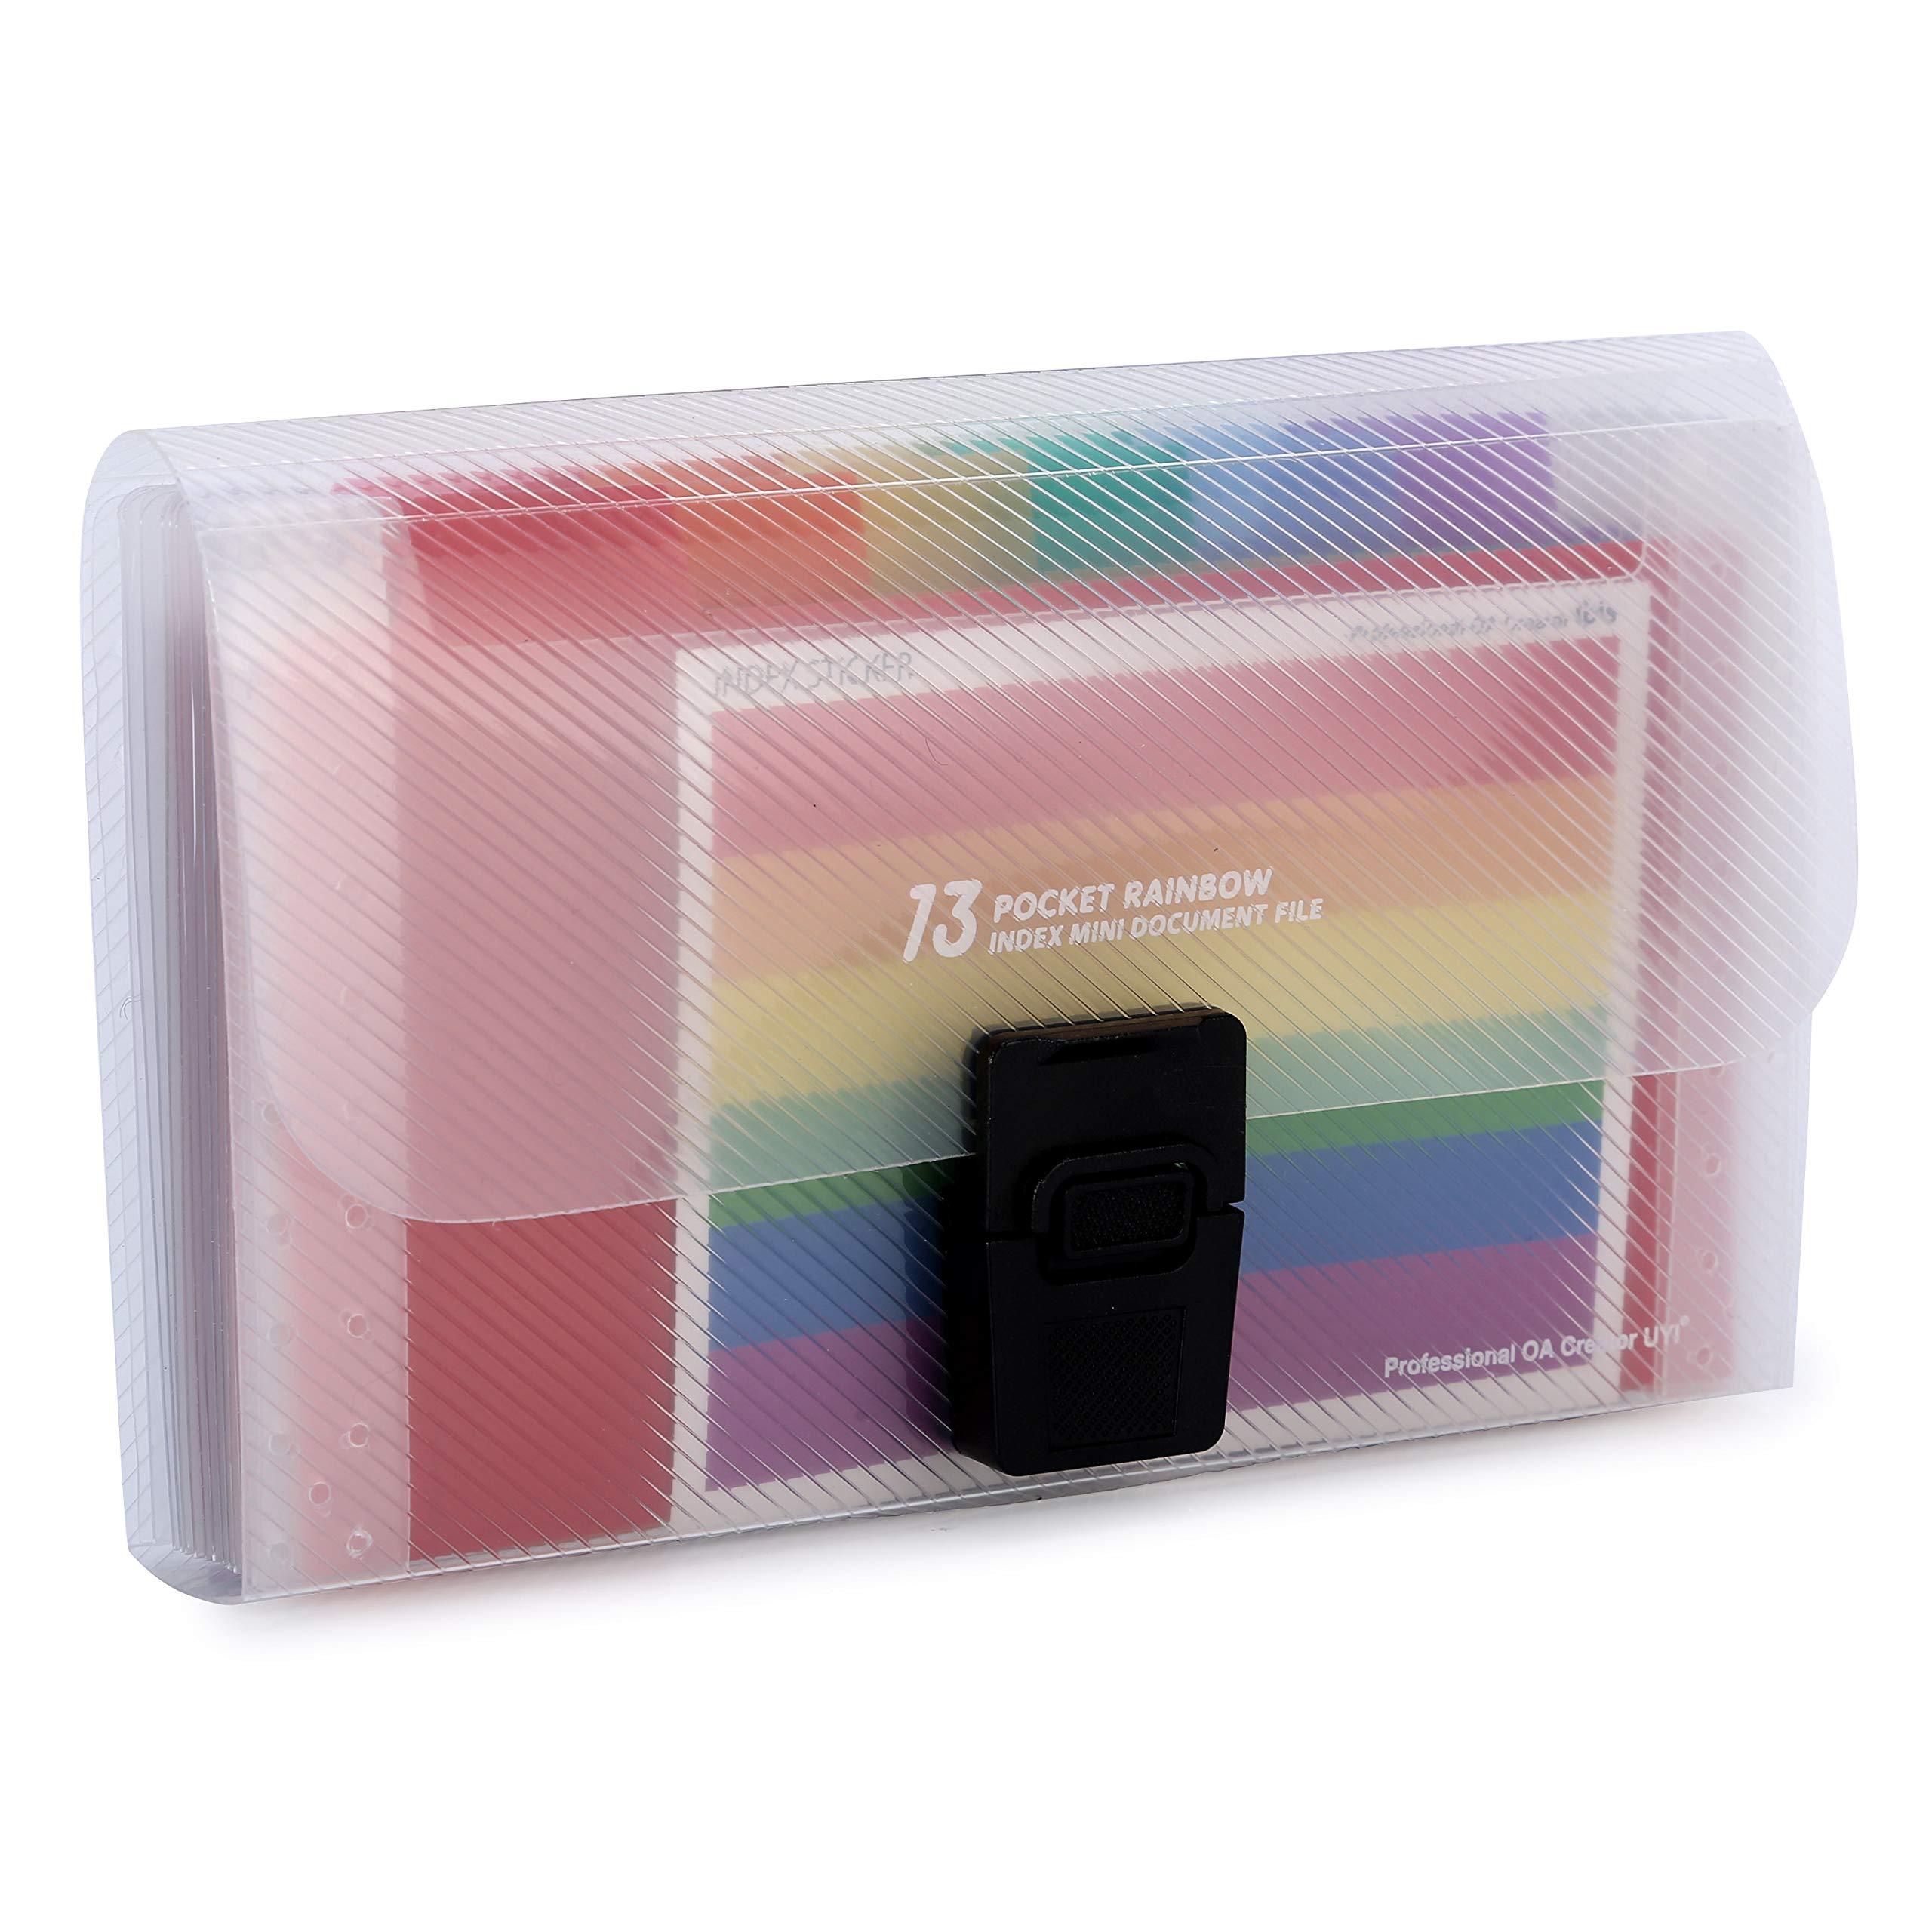 13 Pockets Rainbow A6 Mini Accordion Receipt Organiser Expanding Portable File